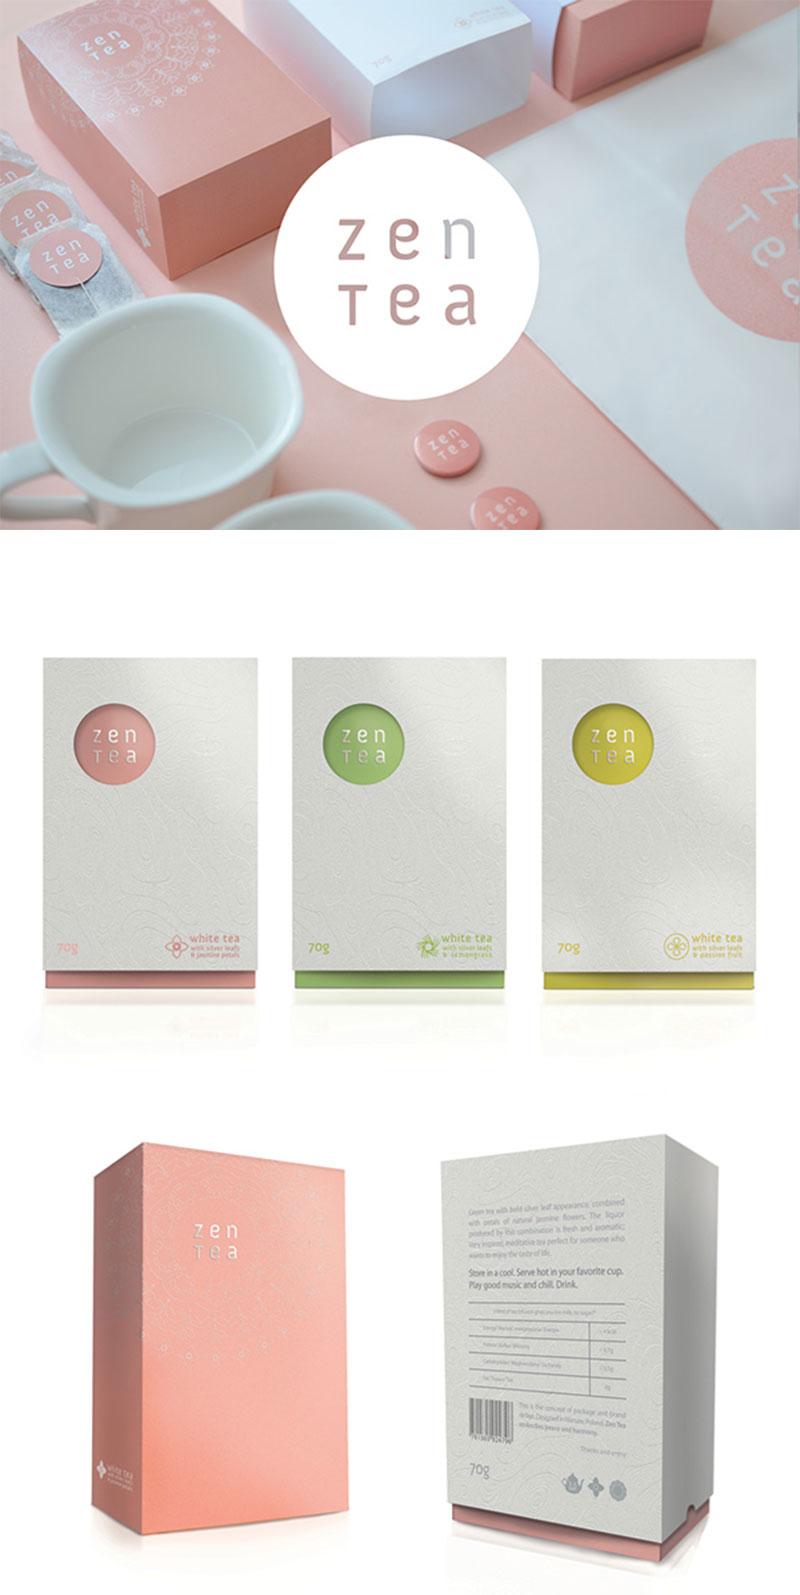 Zen Tea by Konrad Sybilski